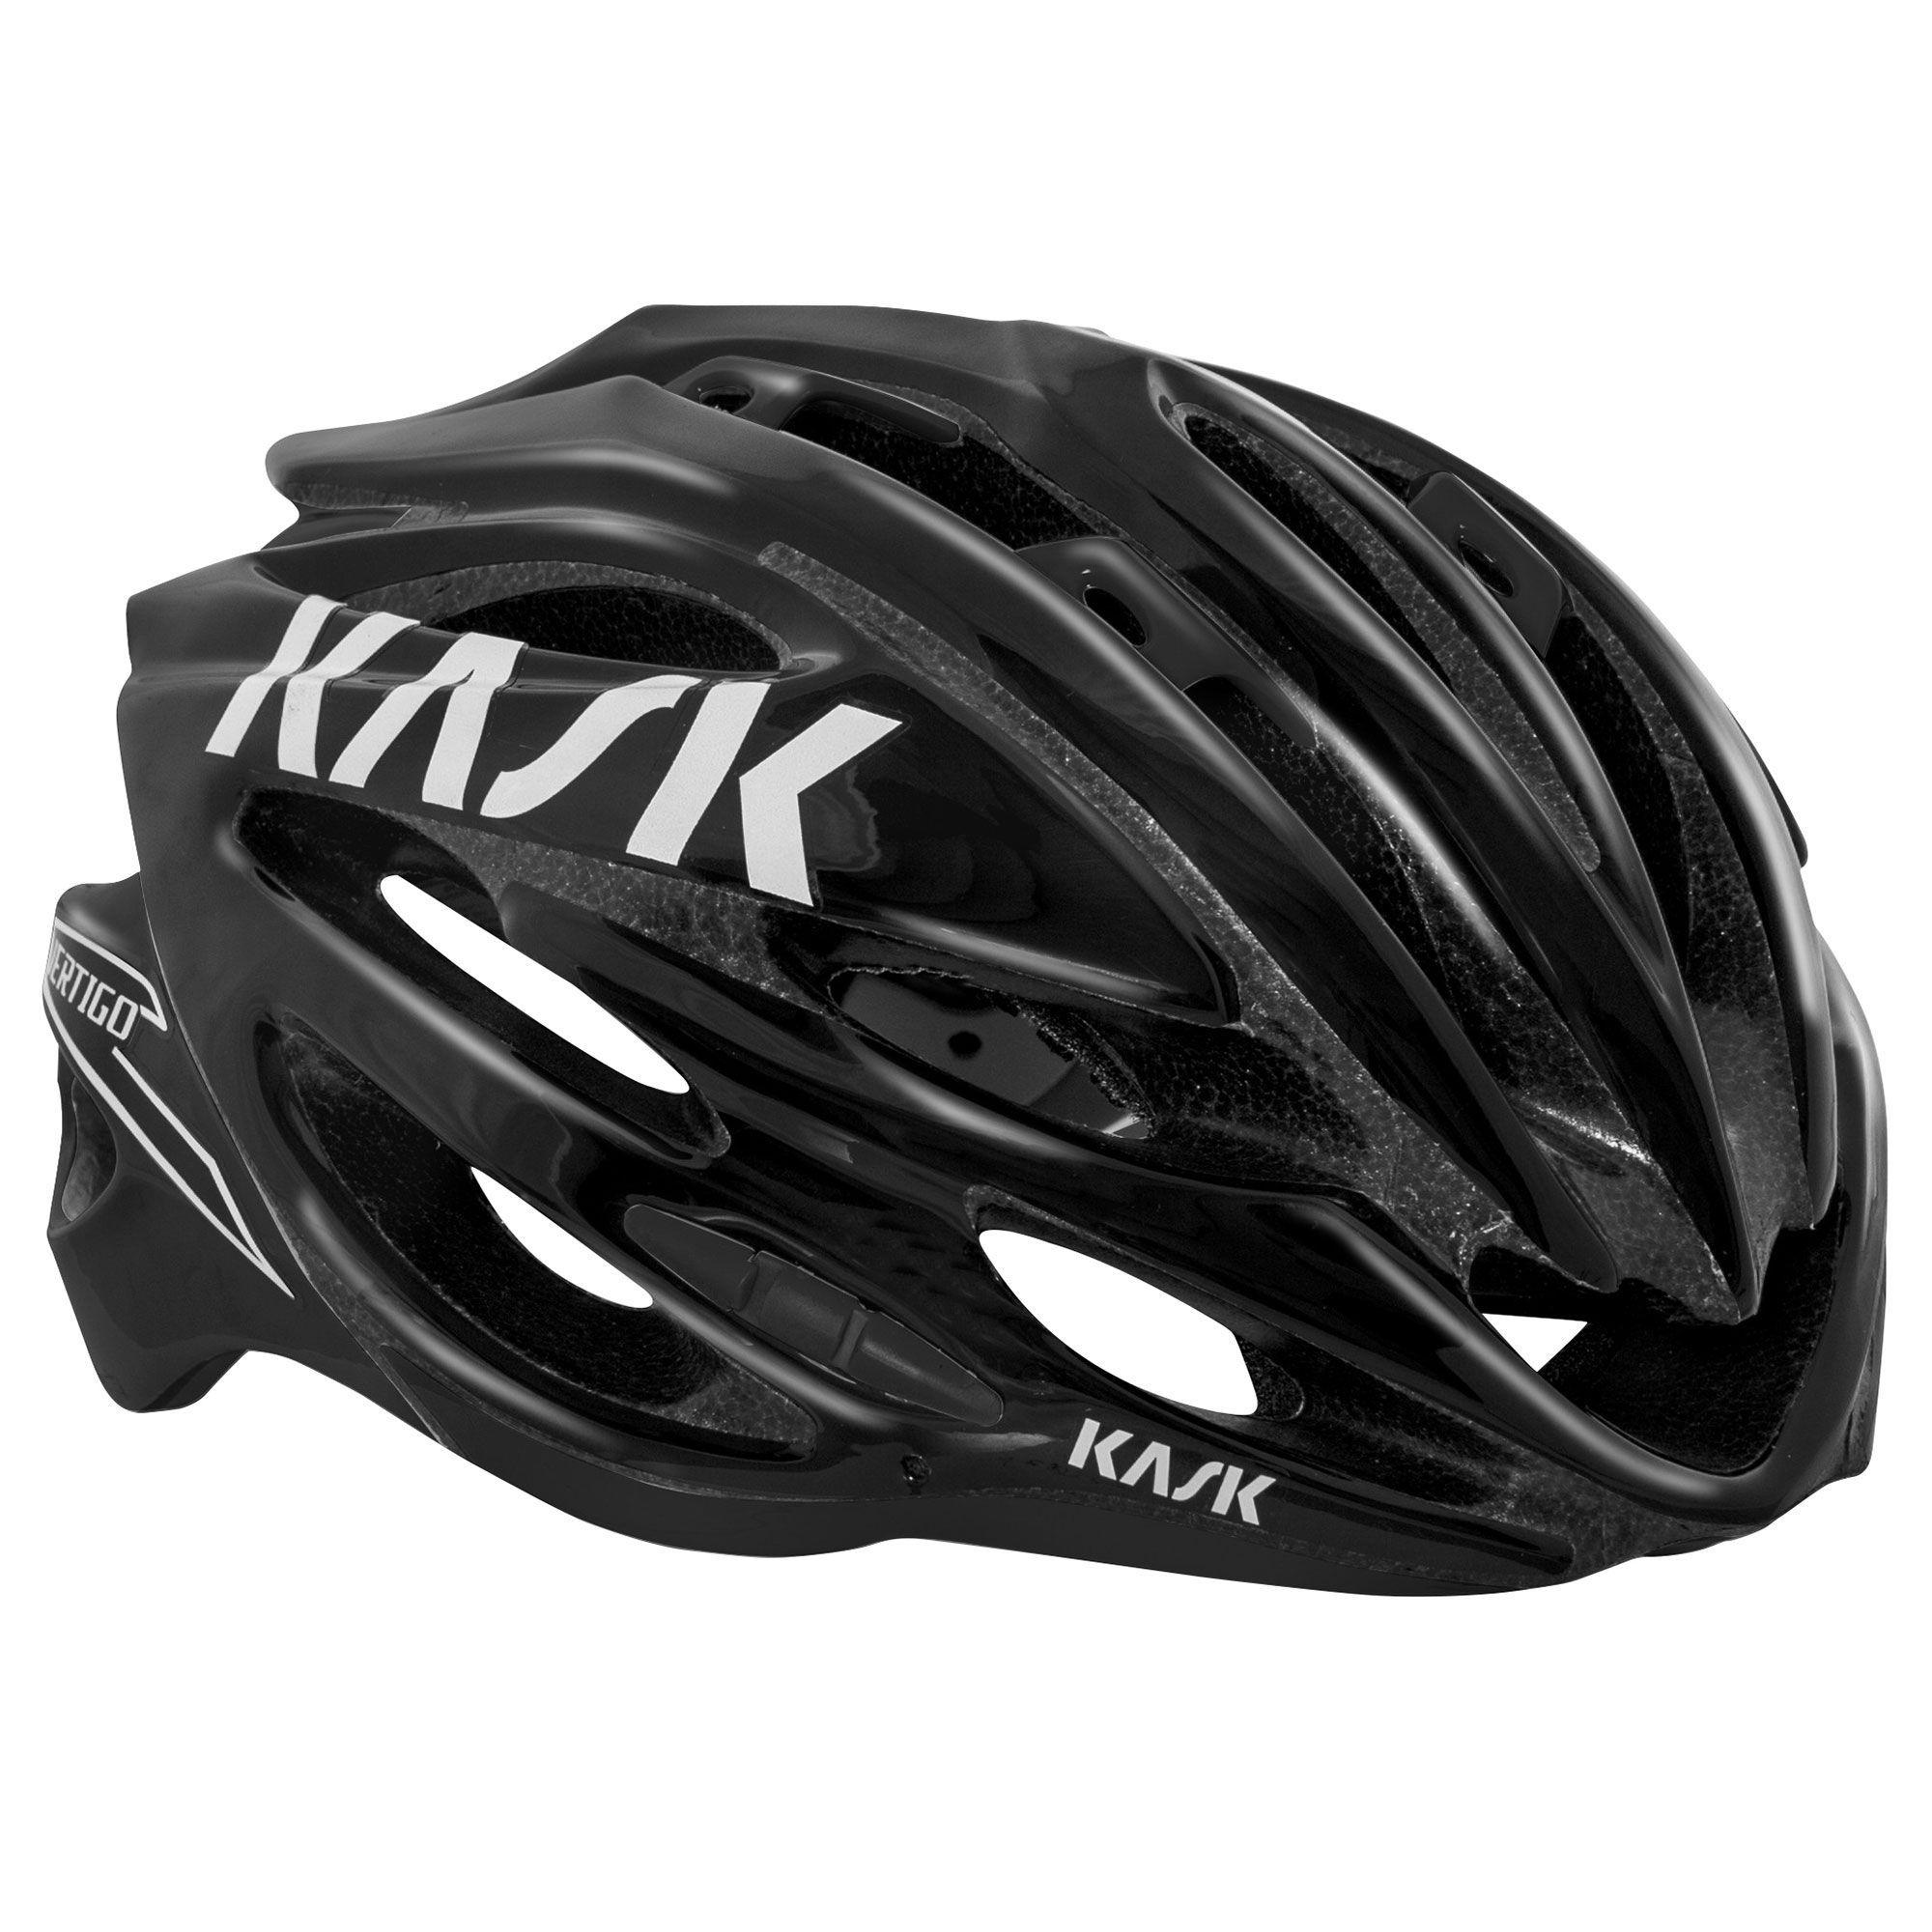 Kask Vertigo 2.0 Road Helmet Black CyclingBargains